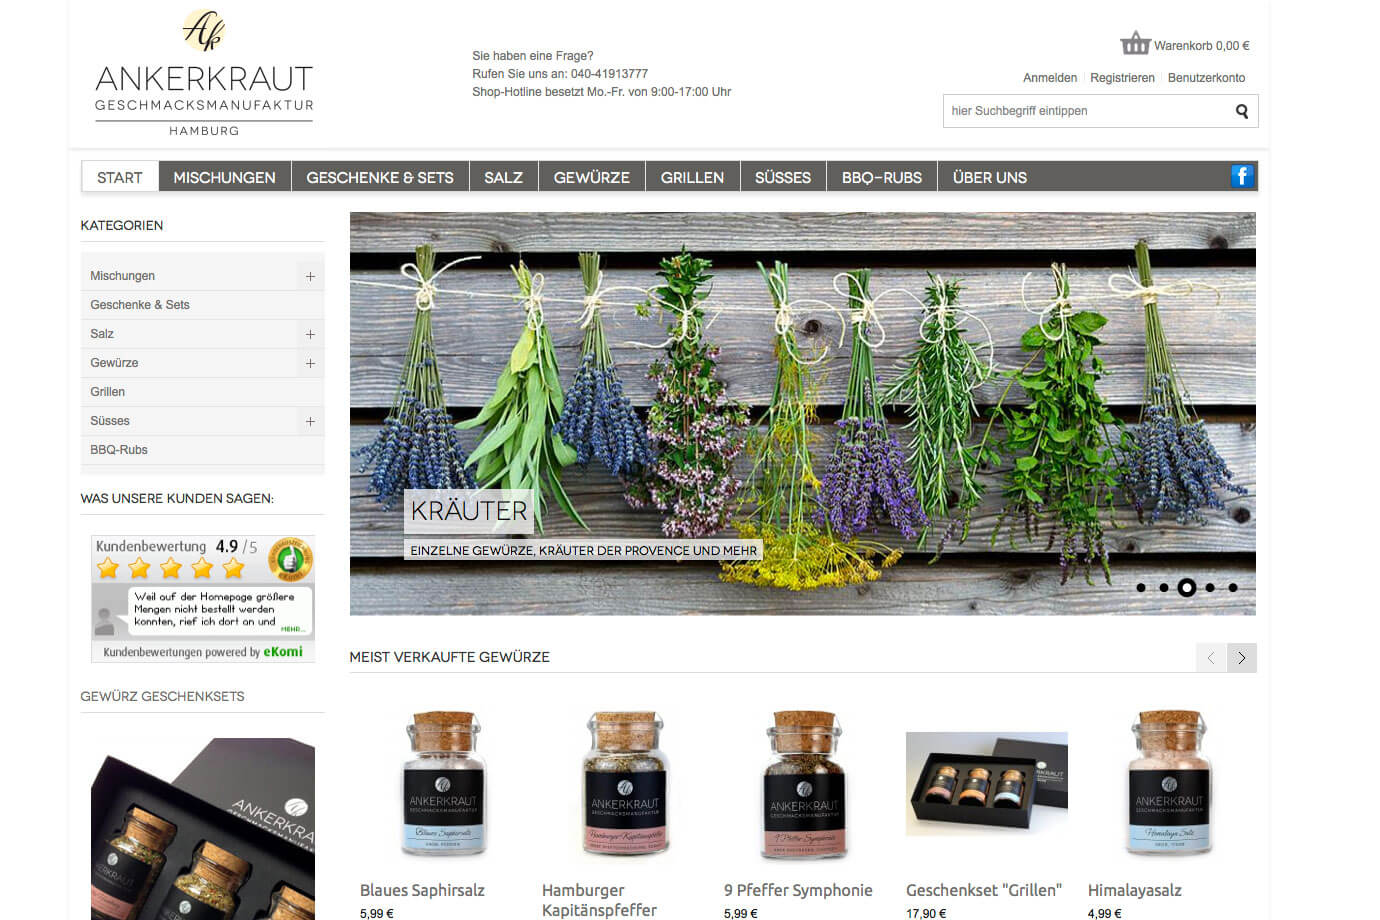 Ankerkraut, Schnuff & Co., Findch, mobileBrownie, Selbermakler.de